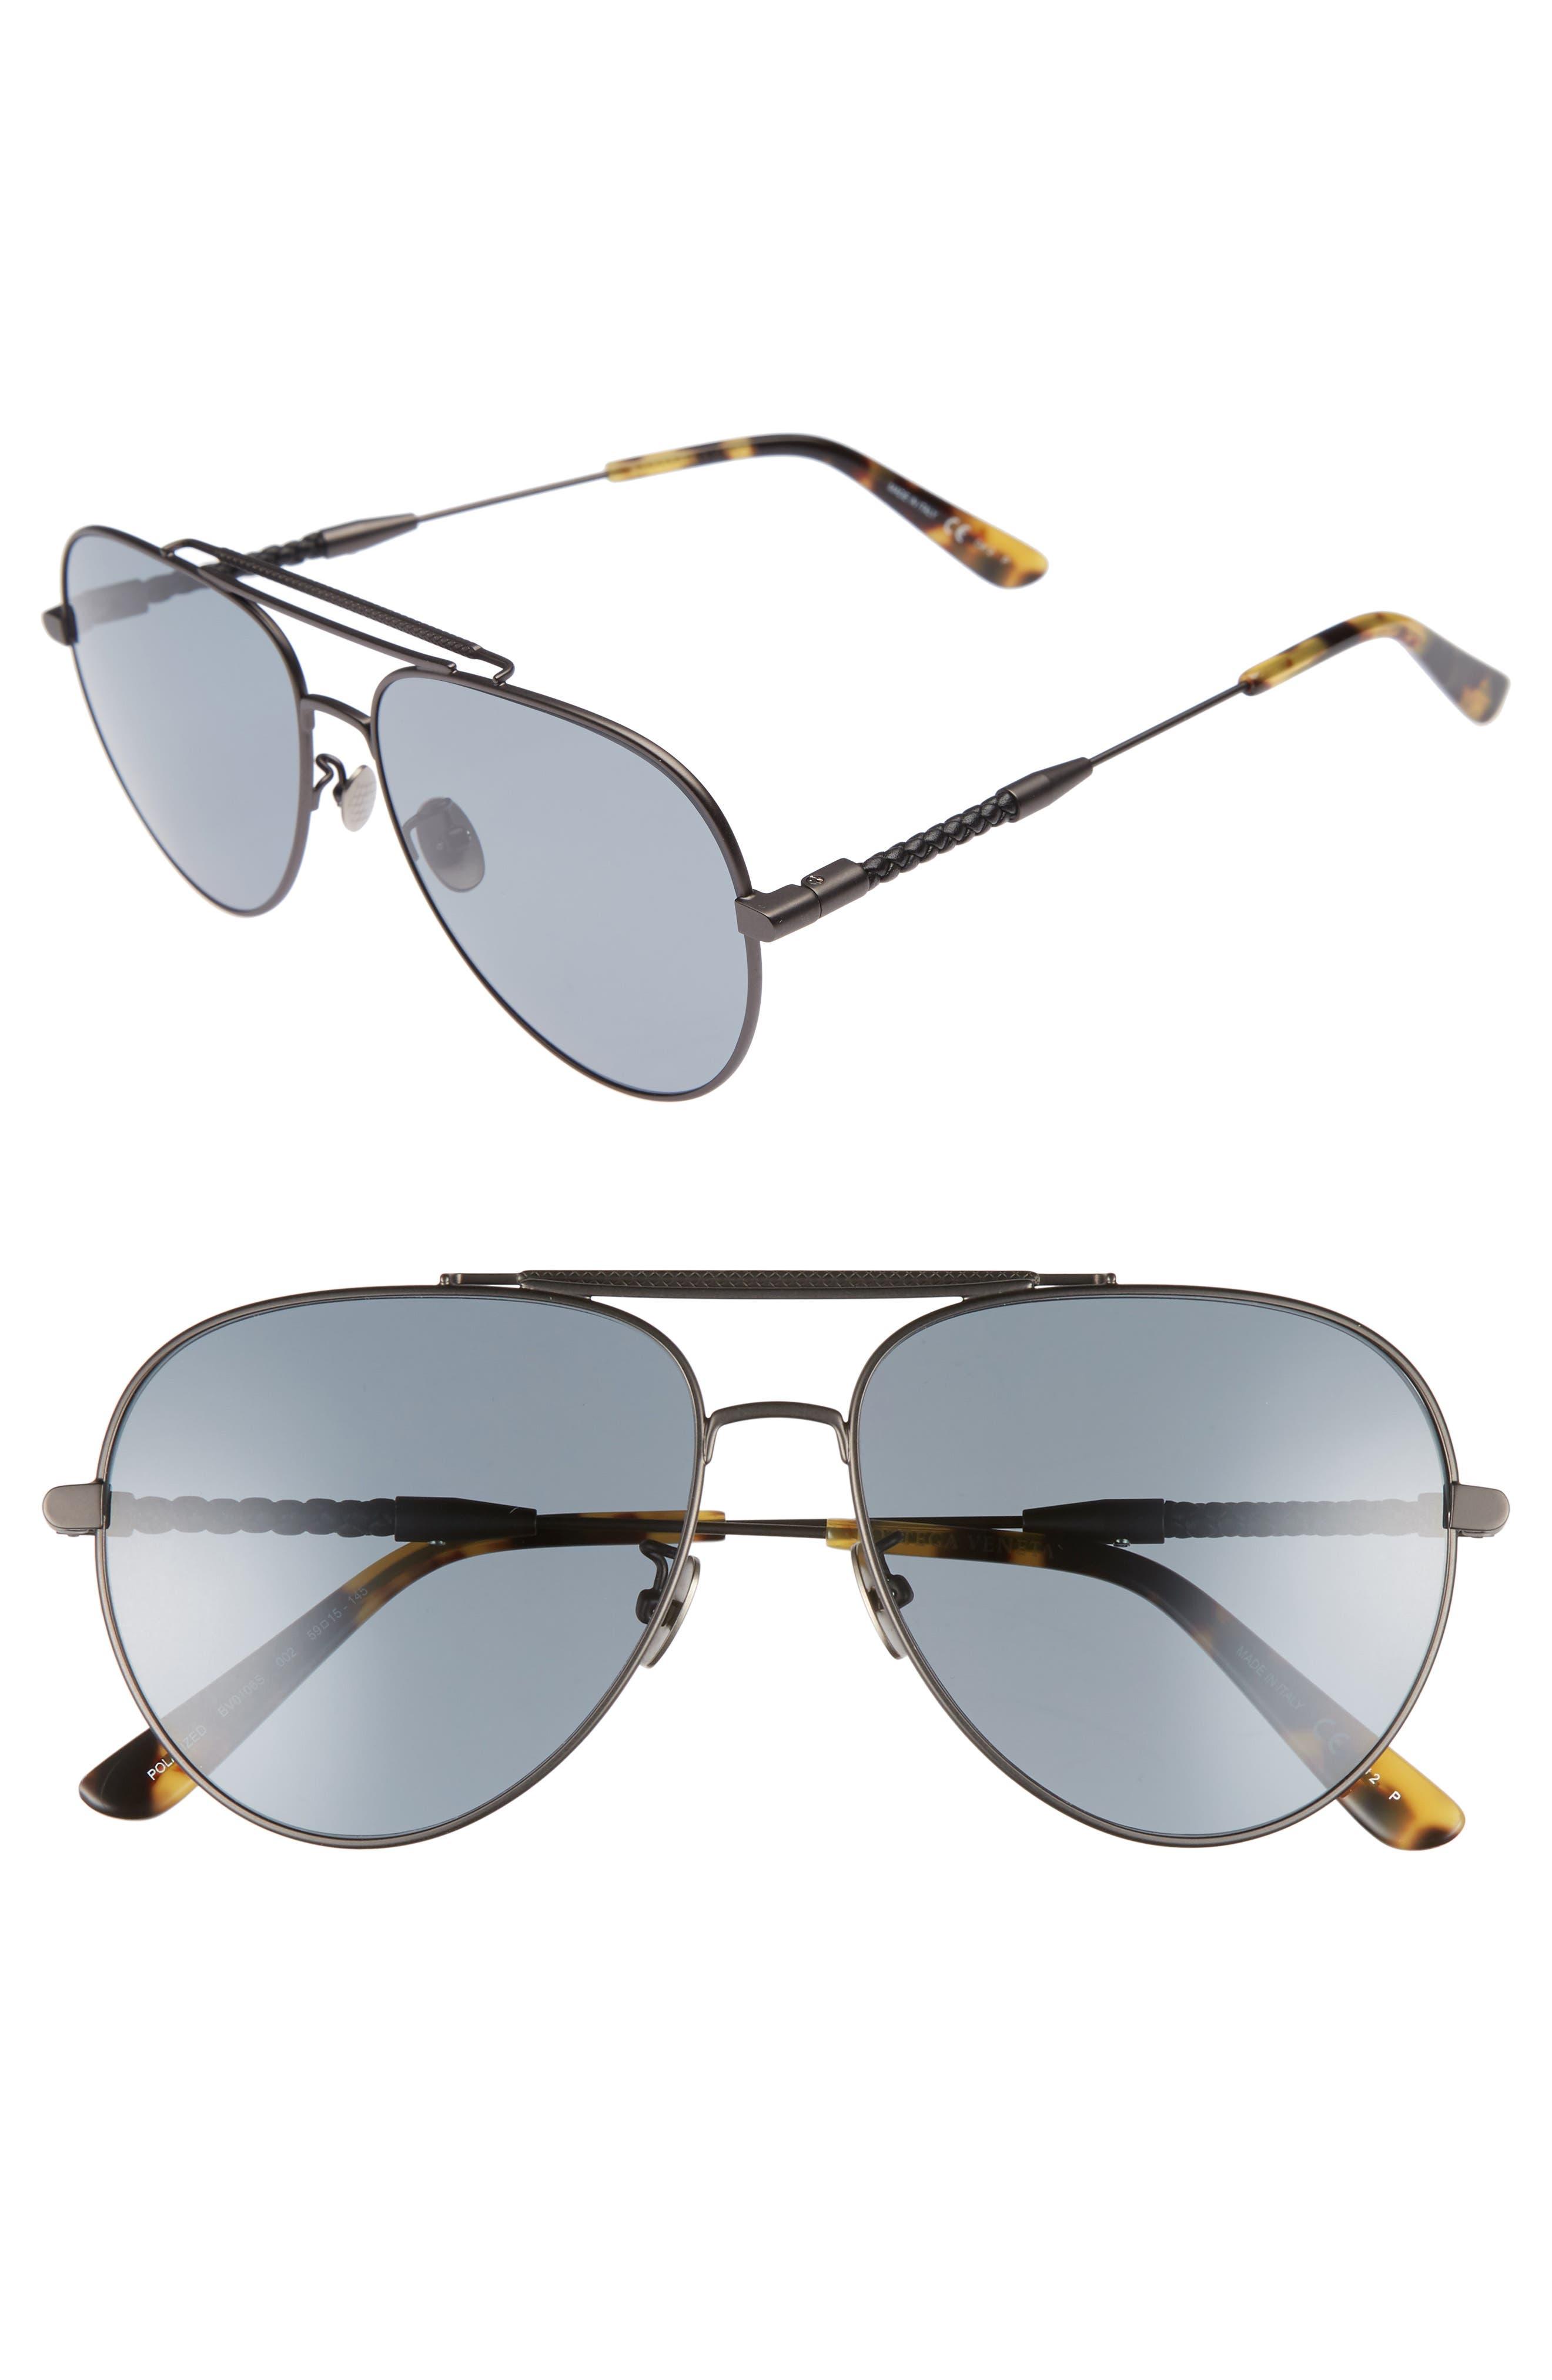 Main Image - Bottega Veneta 59m Polarized Aviator Sunglasses